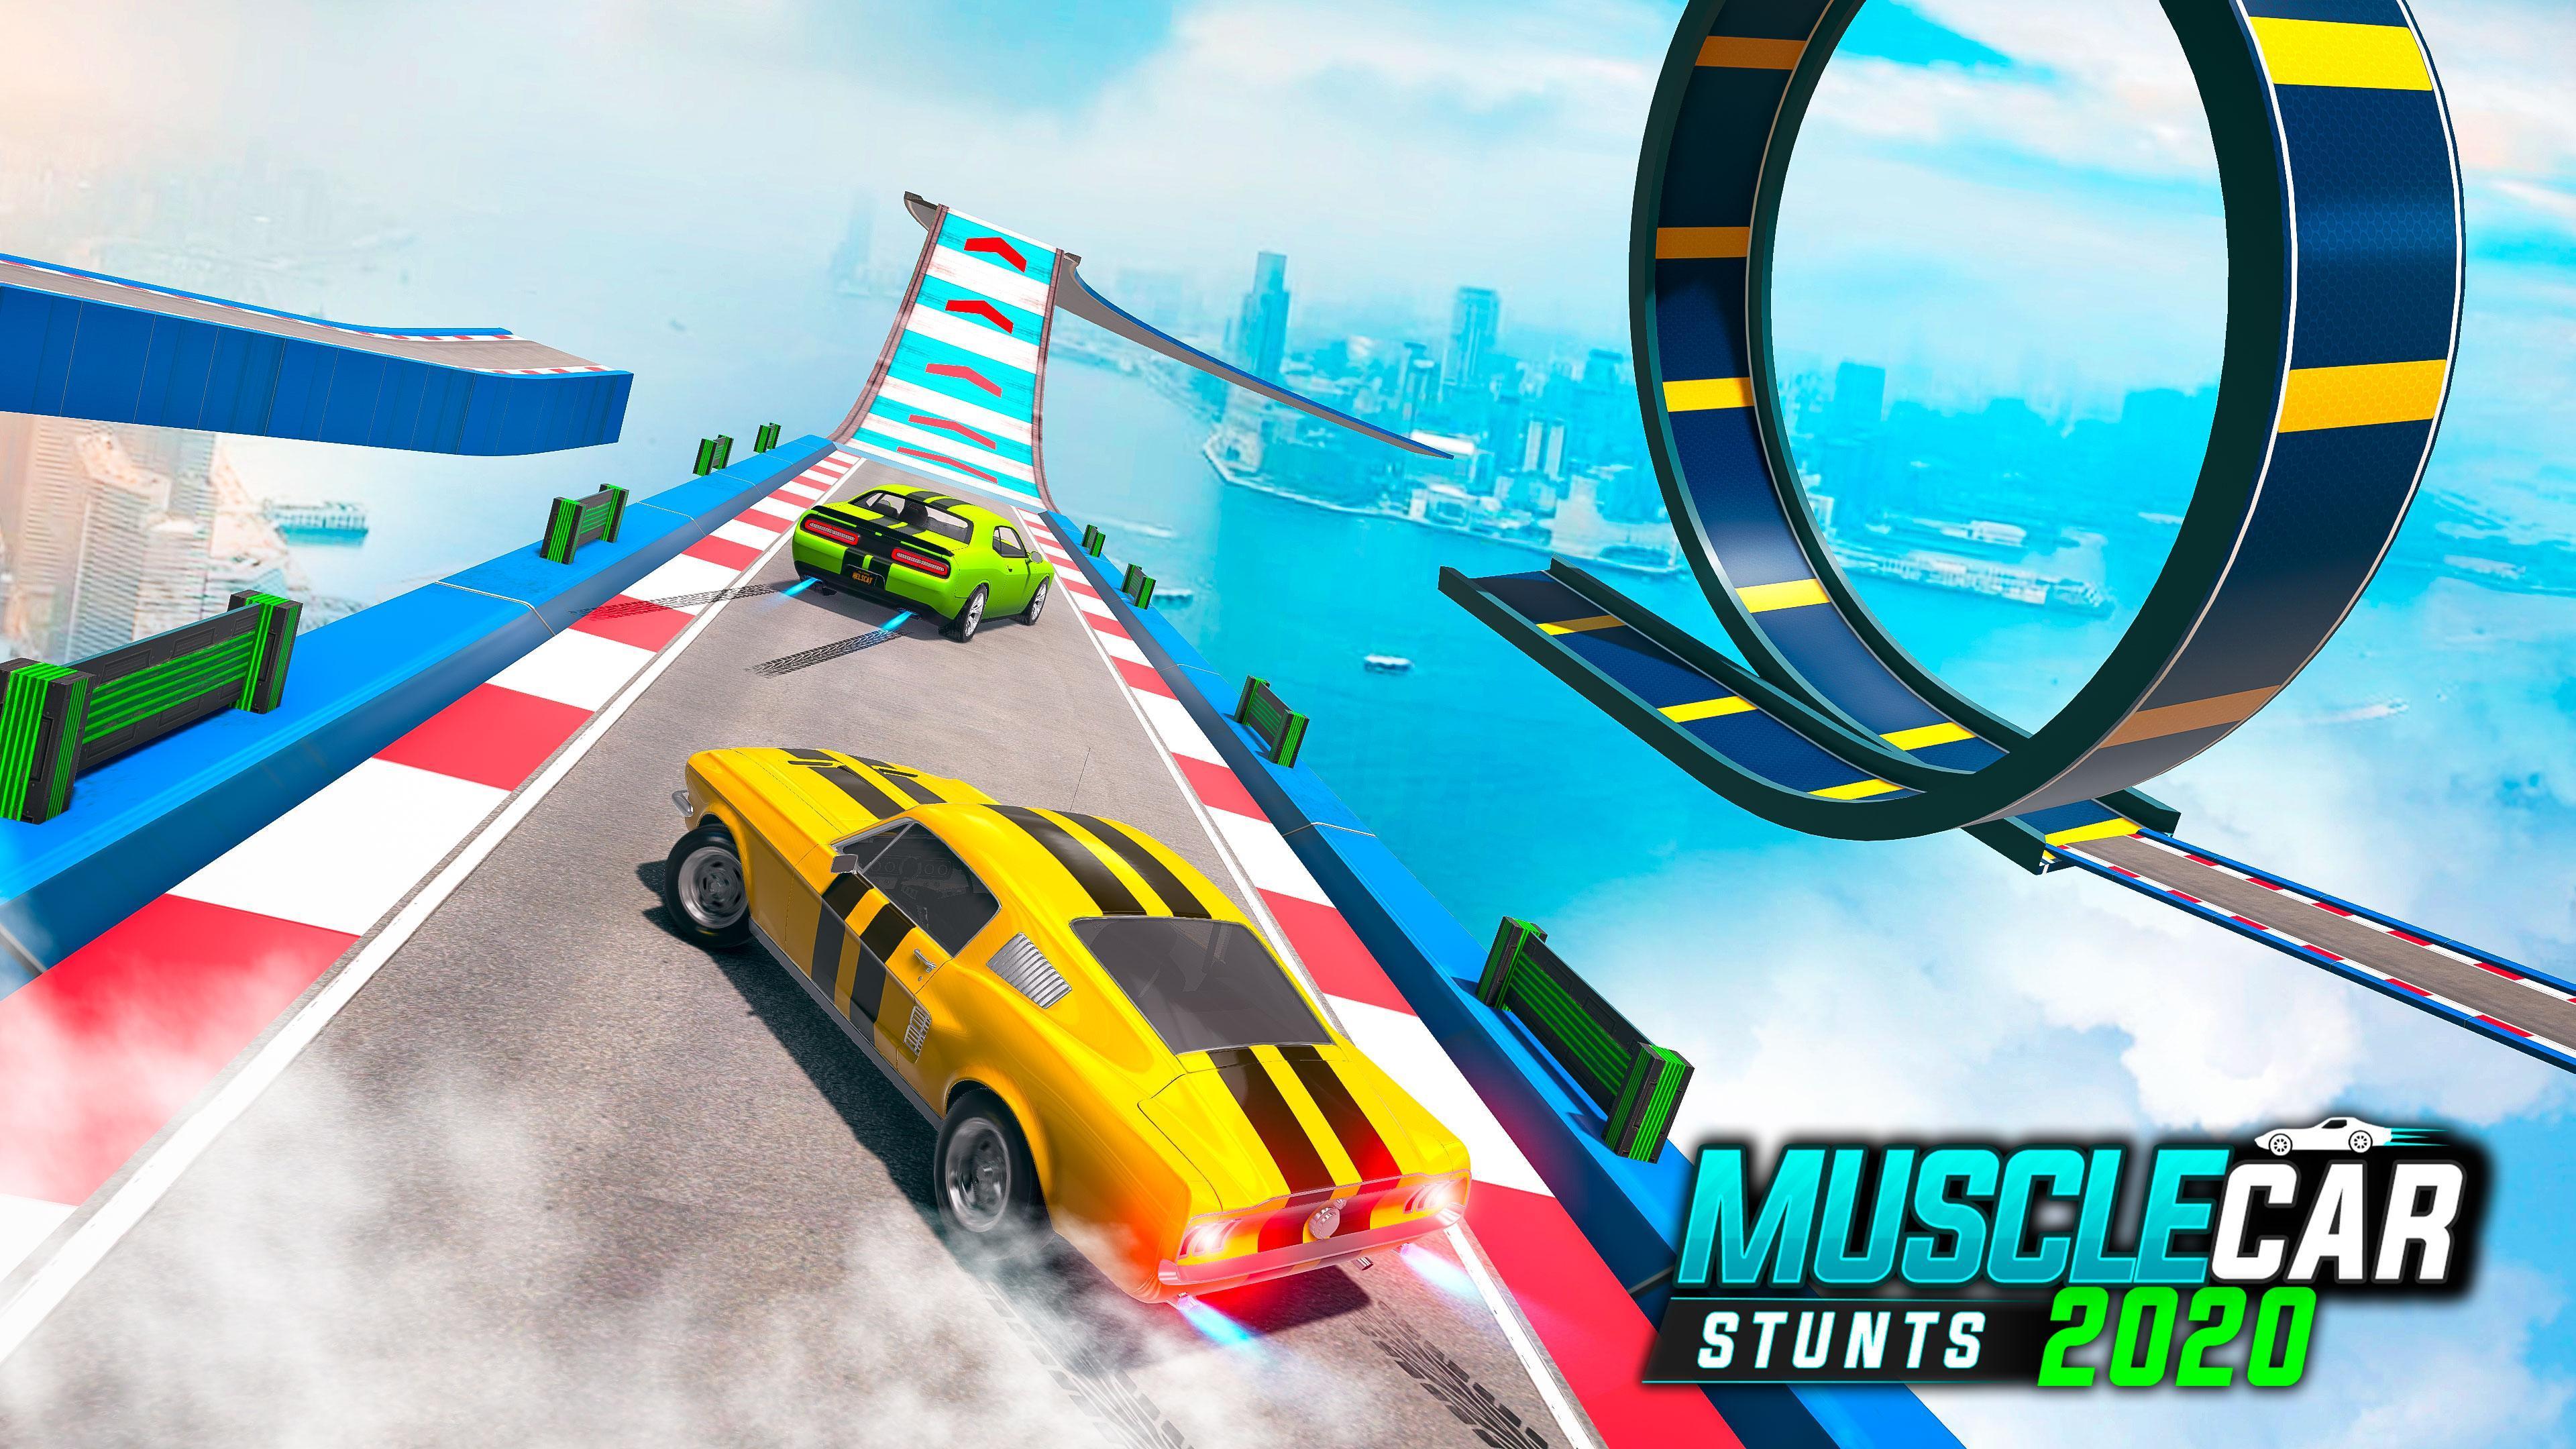 Muscle Car Stunts 2020 Mega Ramp Stunt Car Games 1.0.9 Screenshot 18